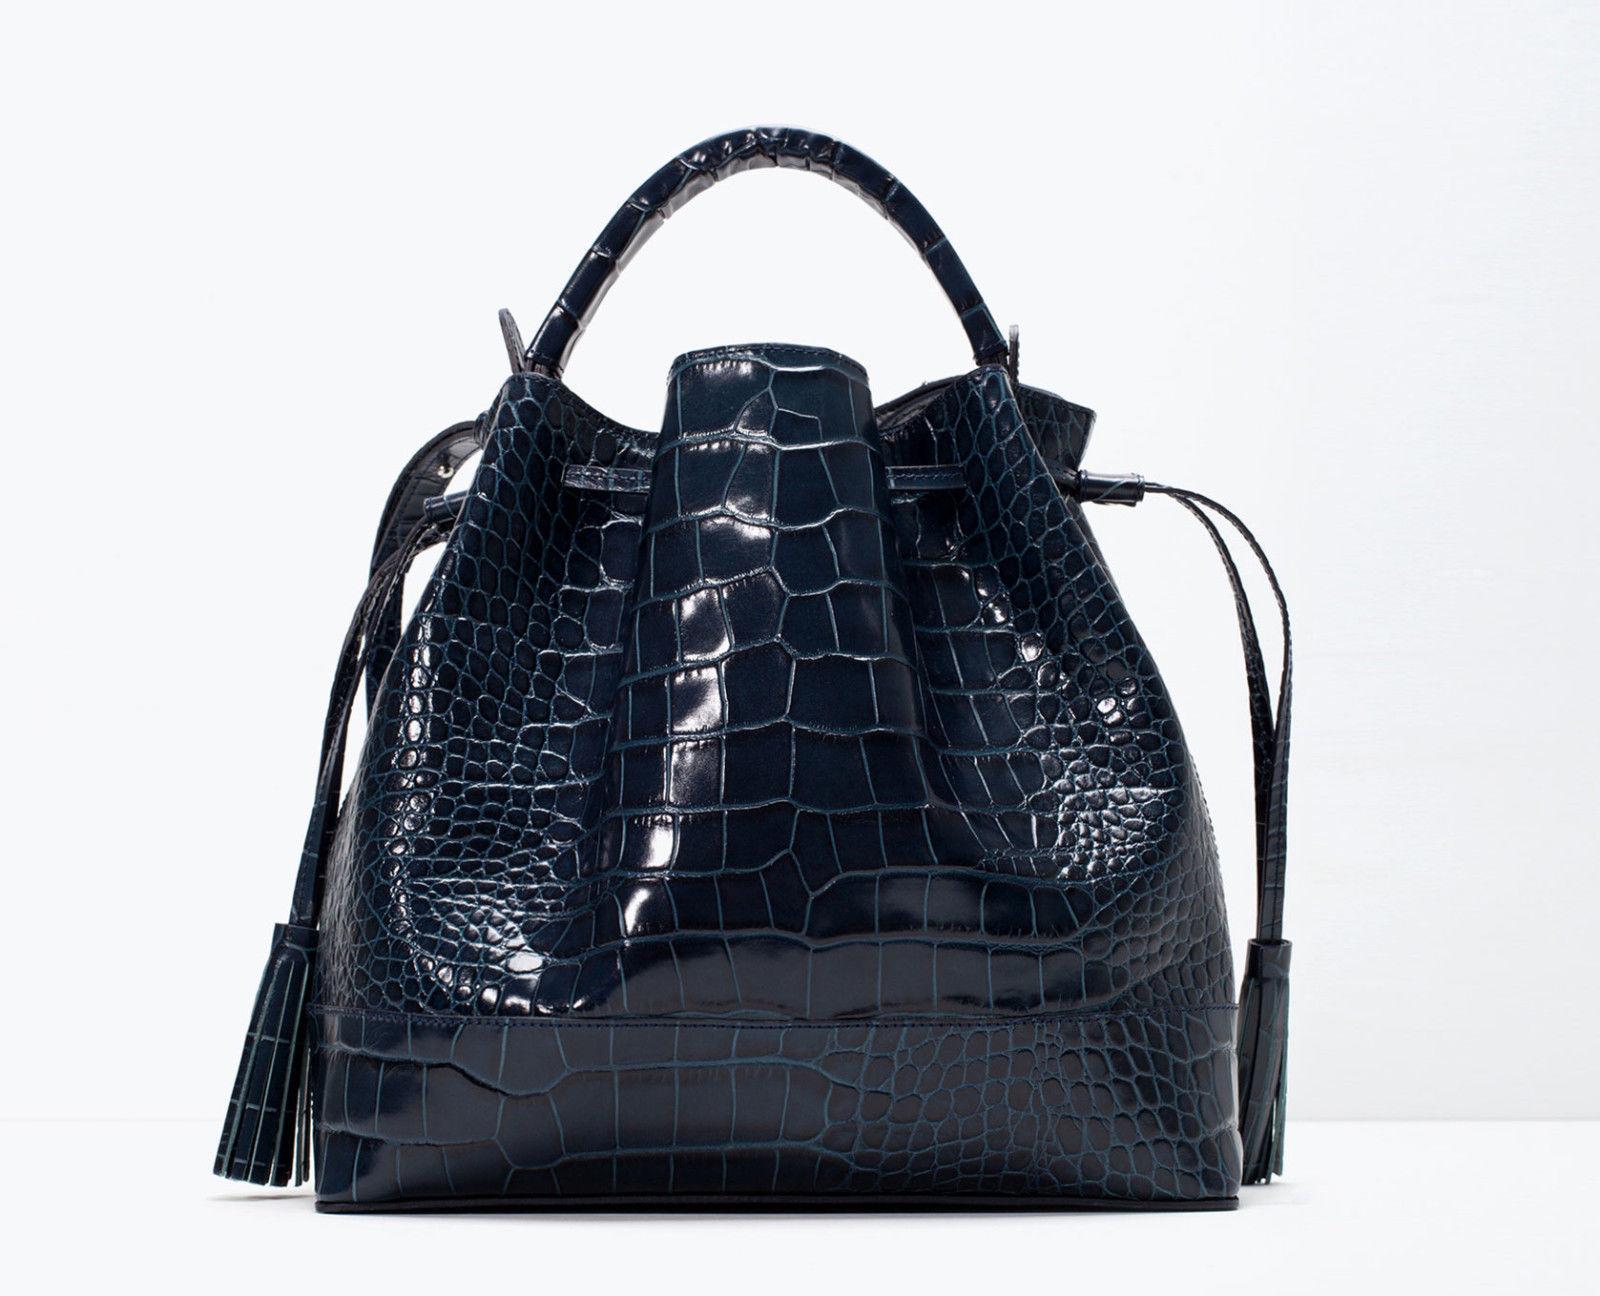 ba0f9de5d8 Zara Petroleum Blue Croc Embossed Leather and 50 similar items